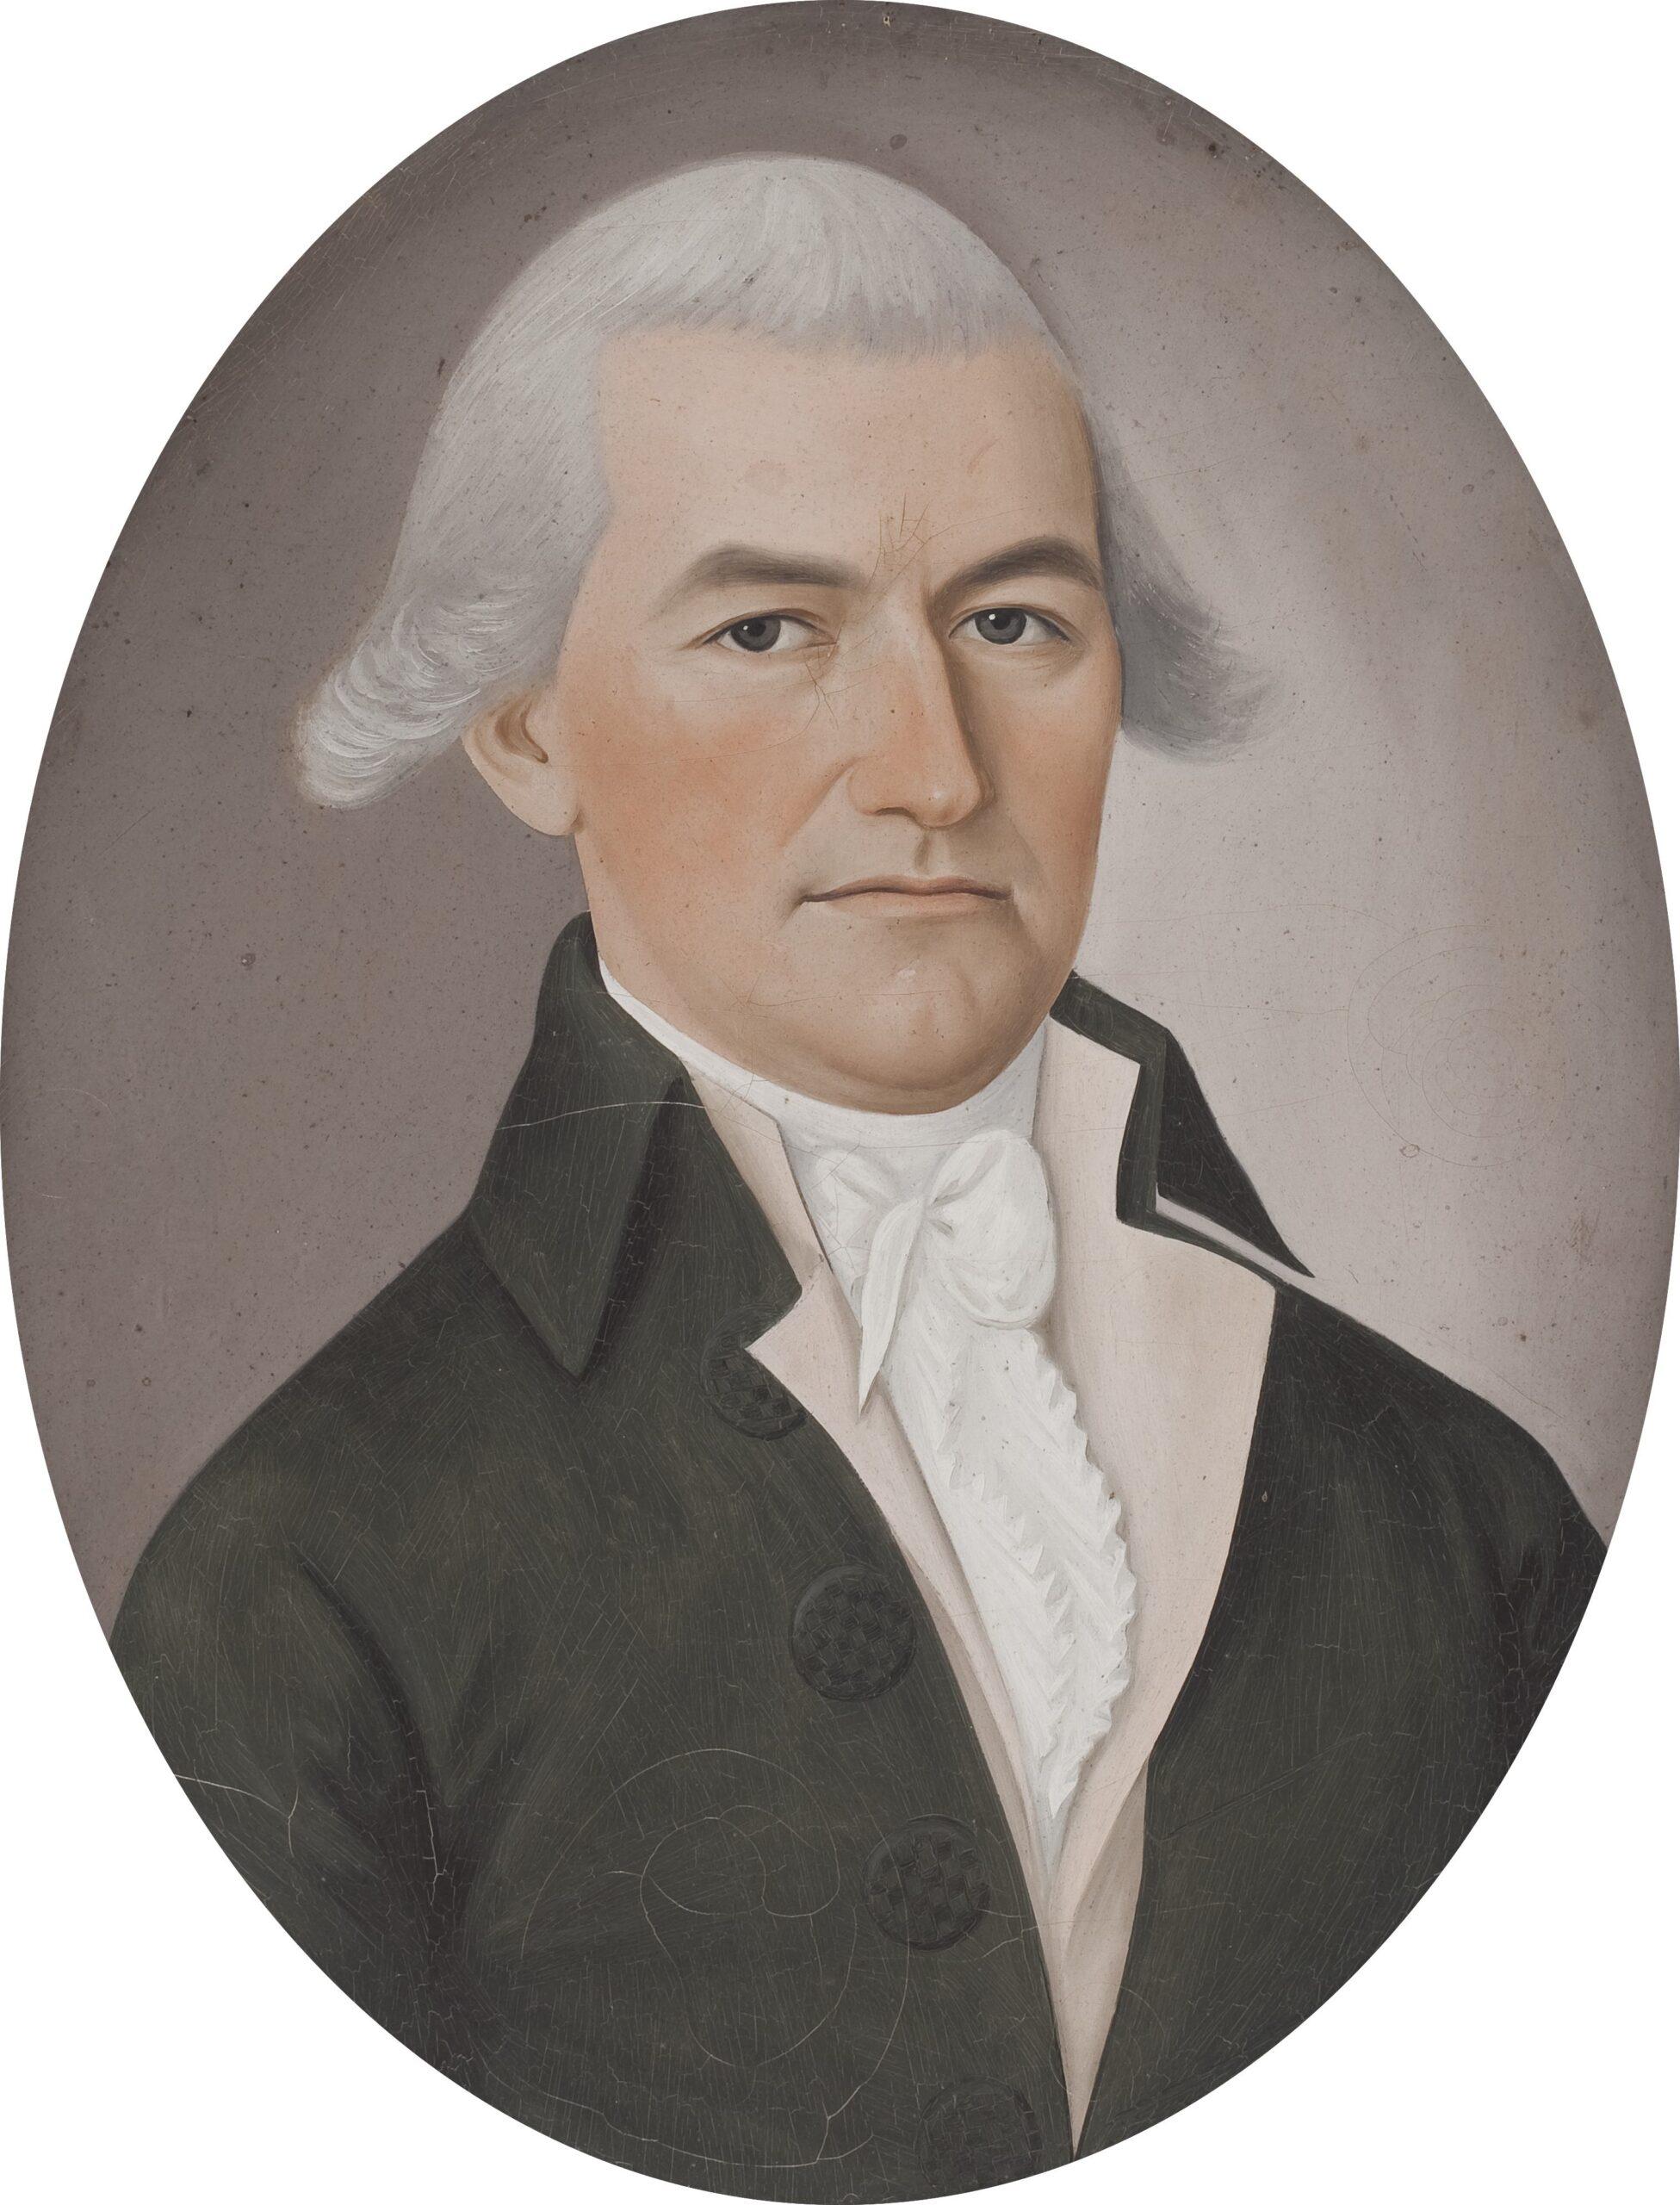 Spoilum (fl. 1774 - 1805) Portrait of Samuel Blanchard Oil on canvas, 17 x 13 1/2 in (oval)